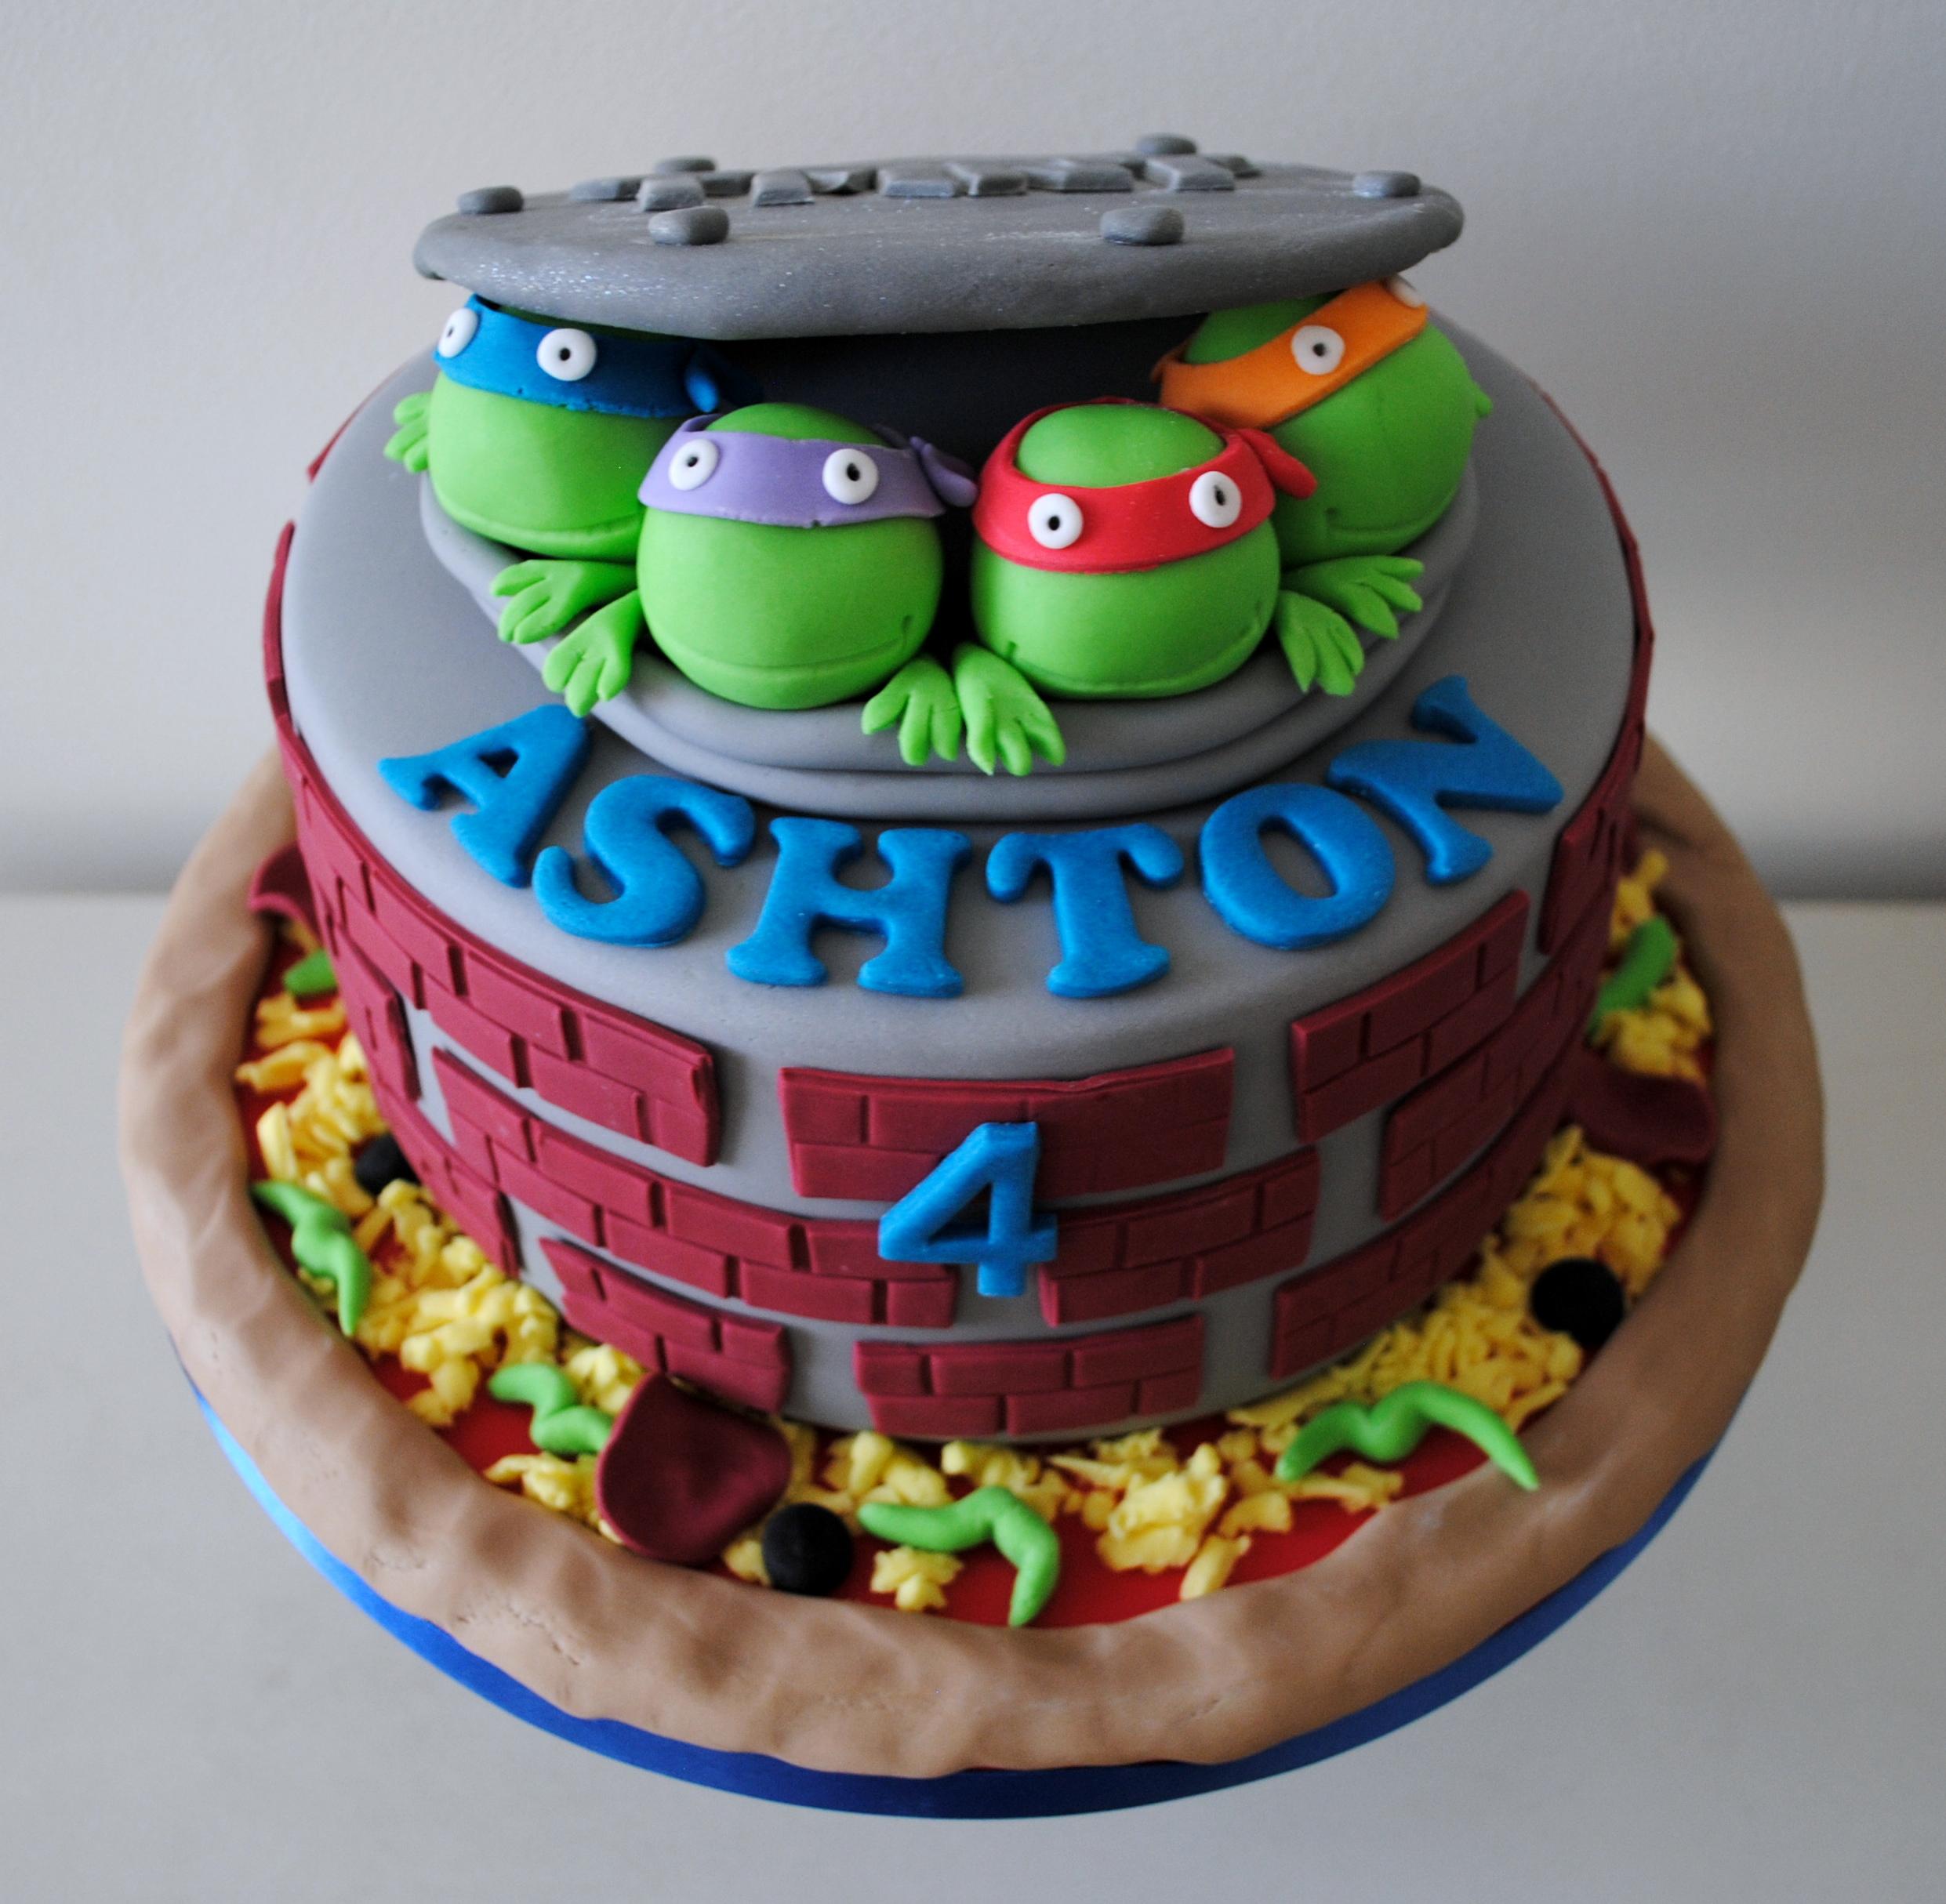 Ninja Turtle Cake Designs